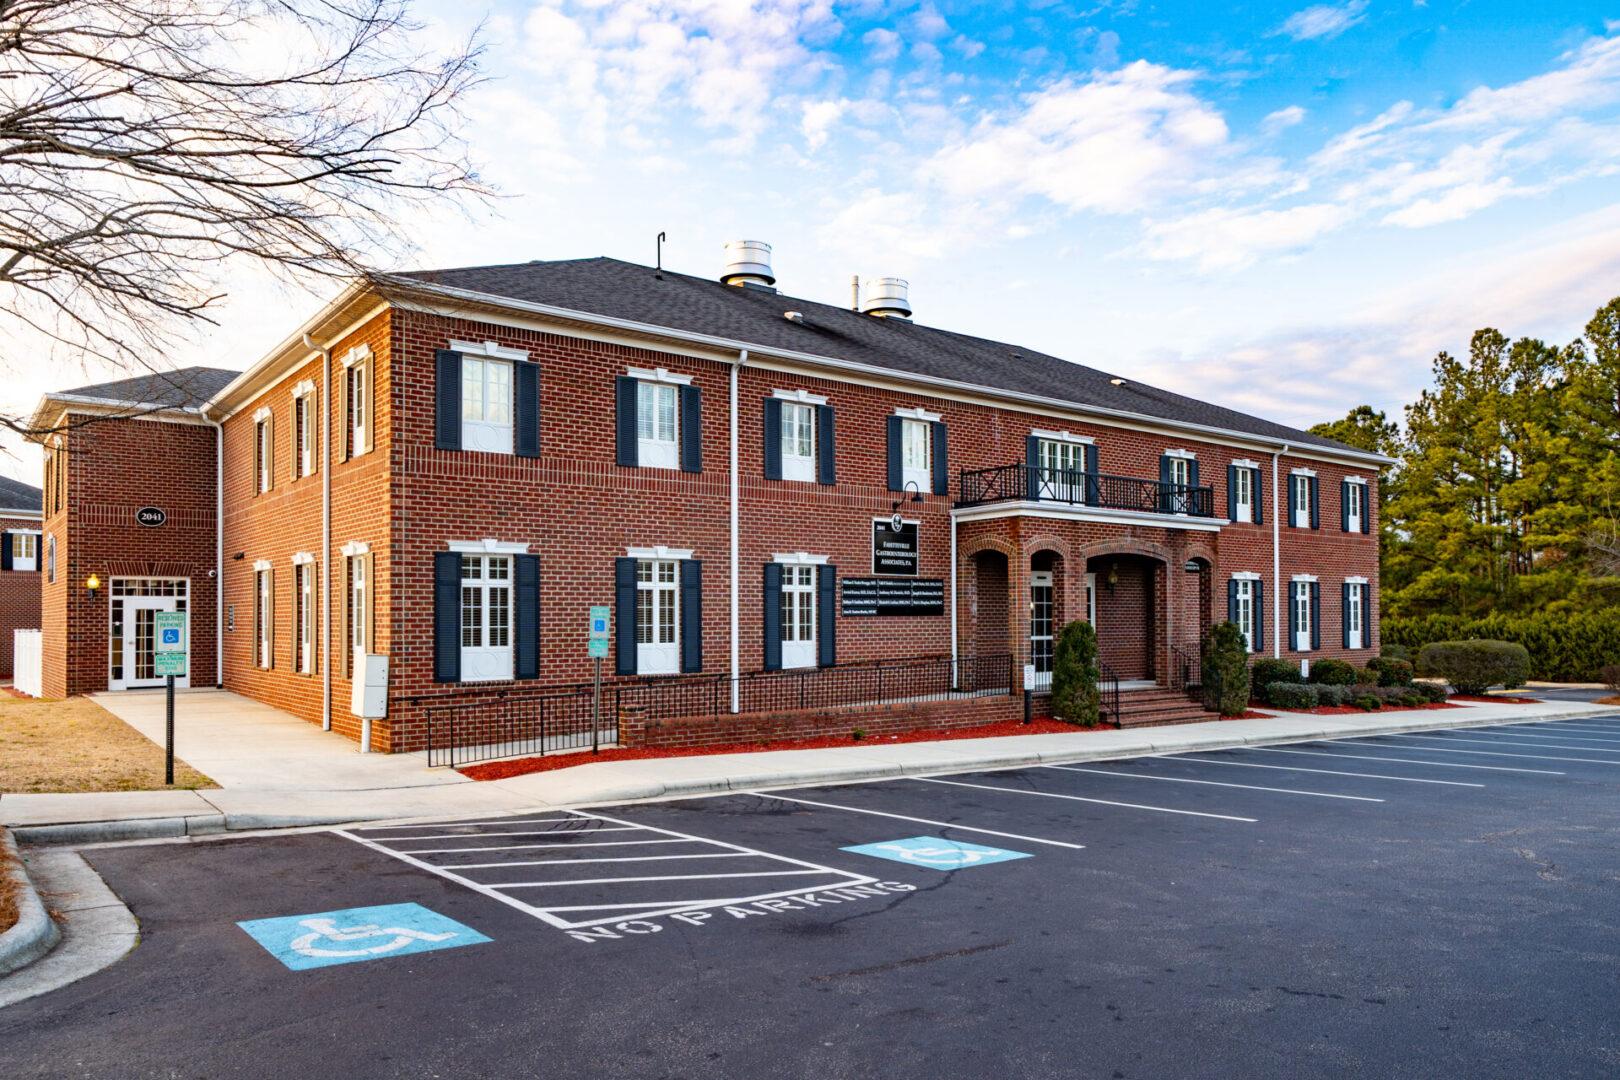 Fayetteville Gastroenterology Associates Building